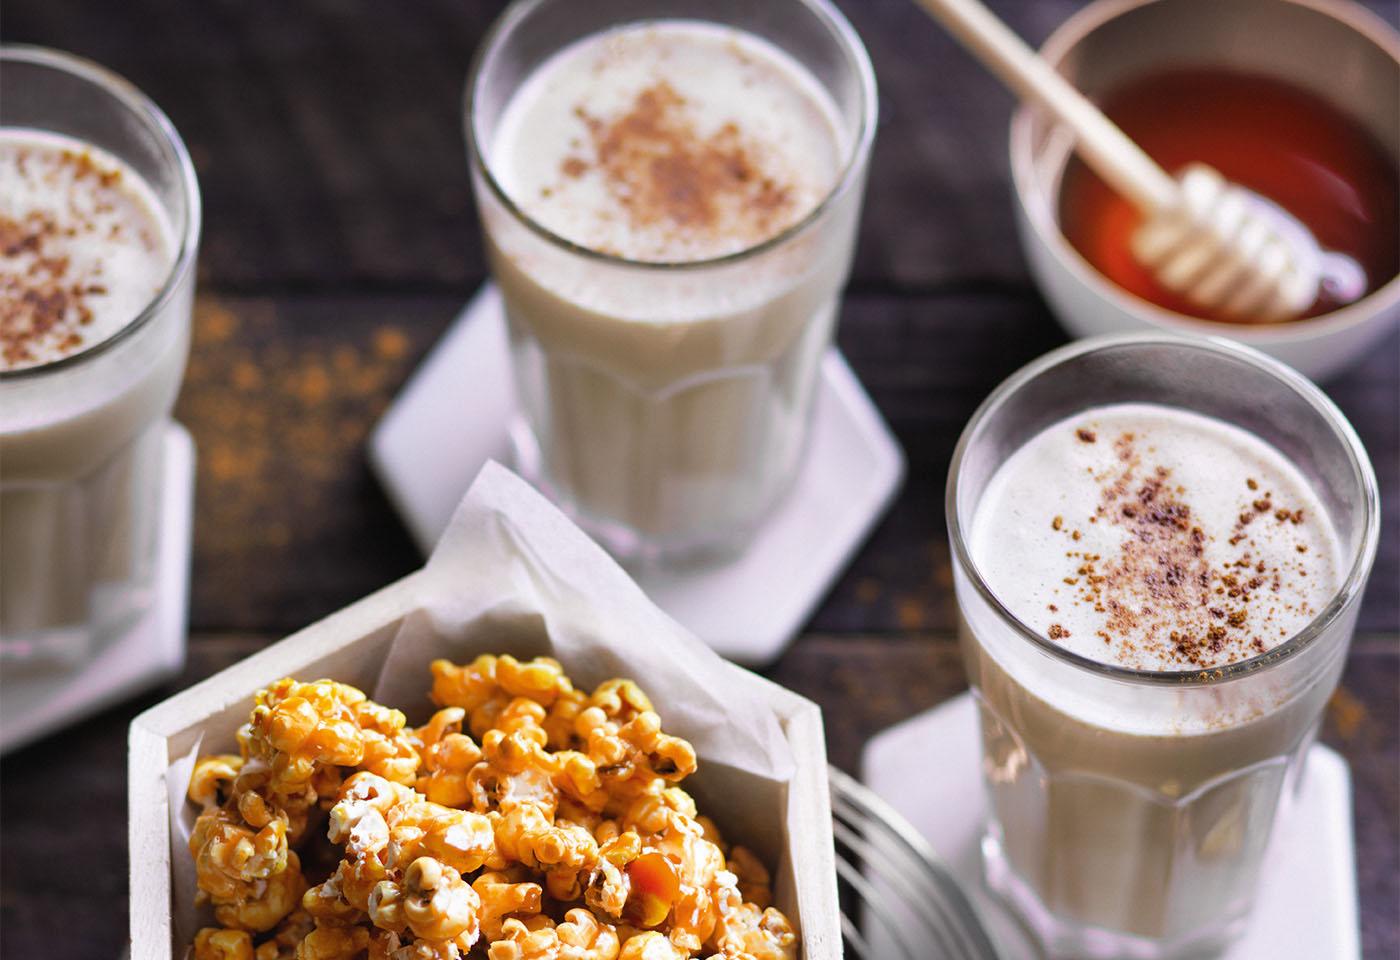 Honigmilch mit Chili Foto: © Ben Dearnley